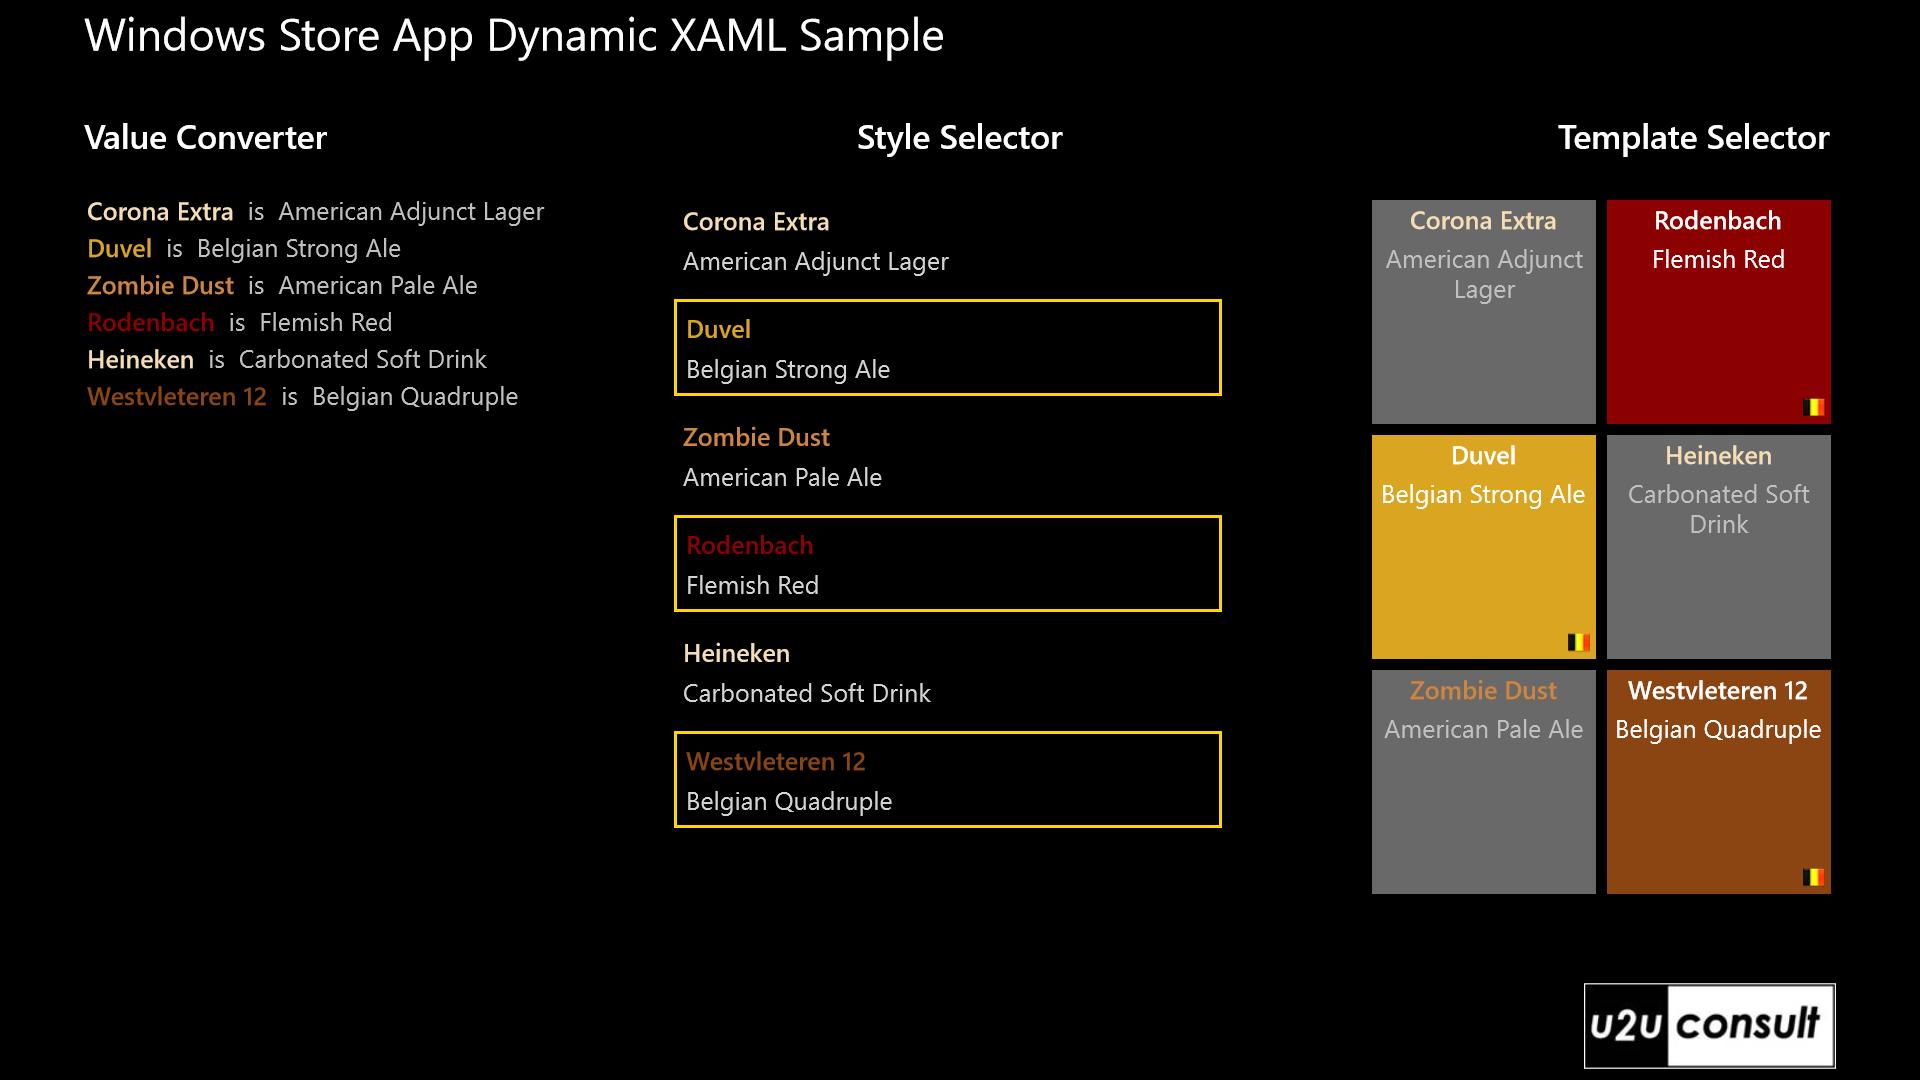 Diederik krols using dynamic xaml in windows 8 store apps for Xaml control template